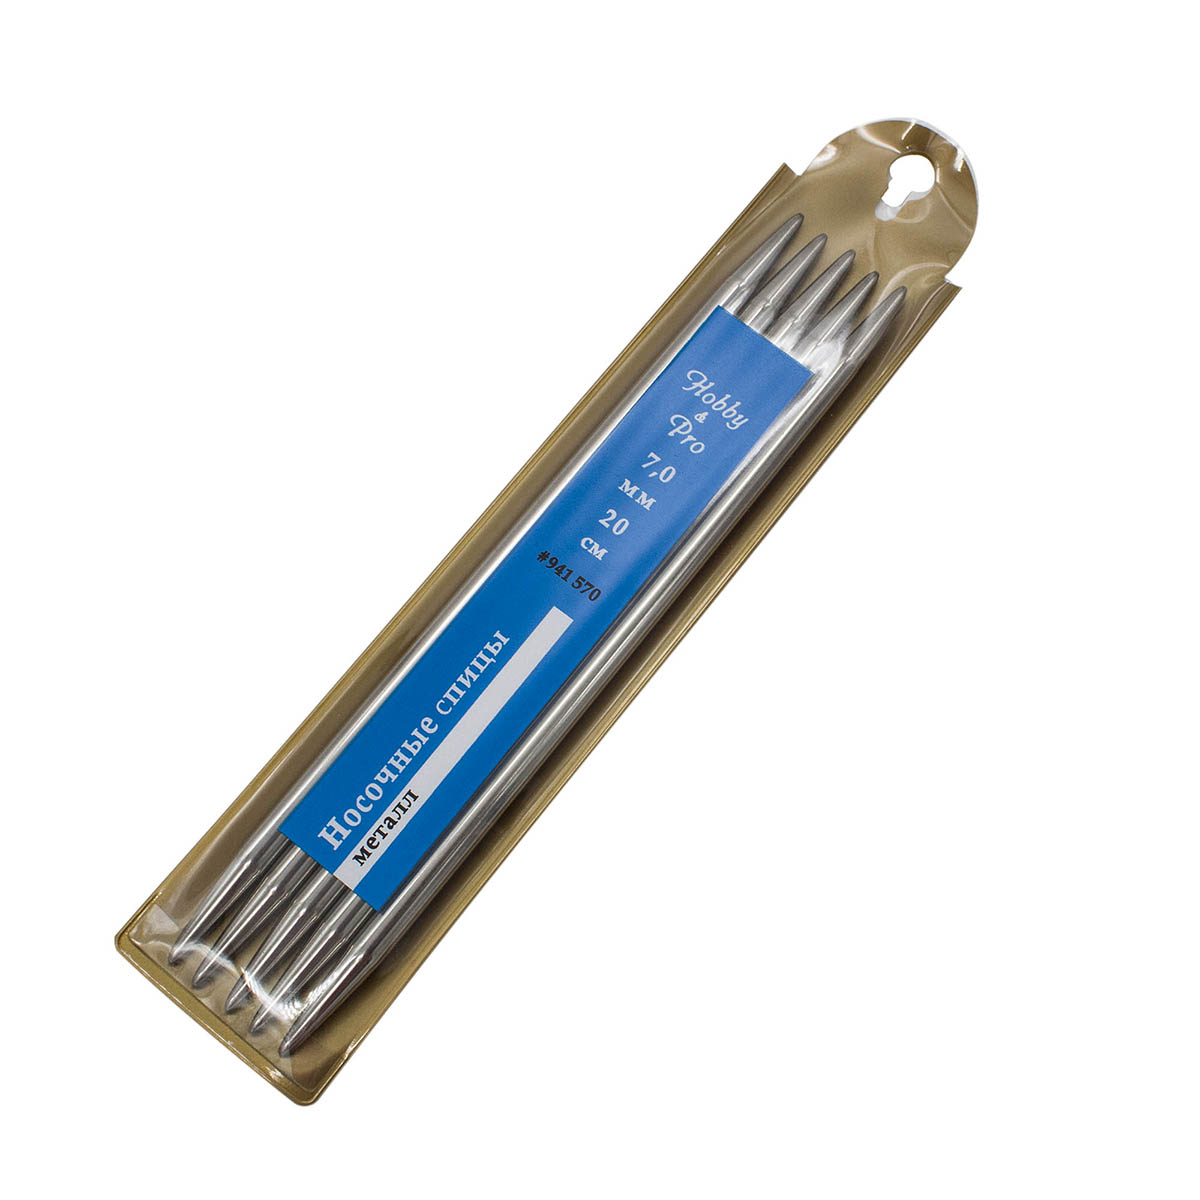 Спицы носочные металл 941570, 20 см, 7,0 мм, Hobby&Pro